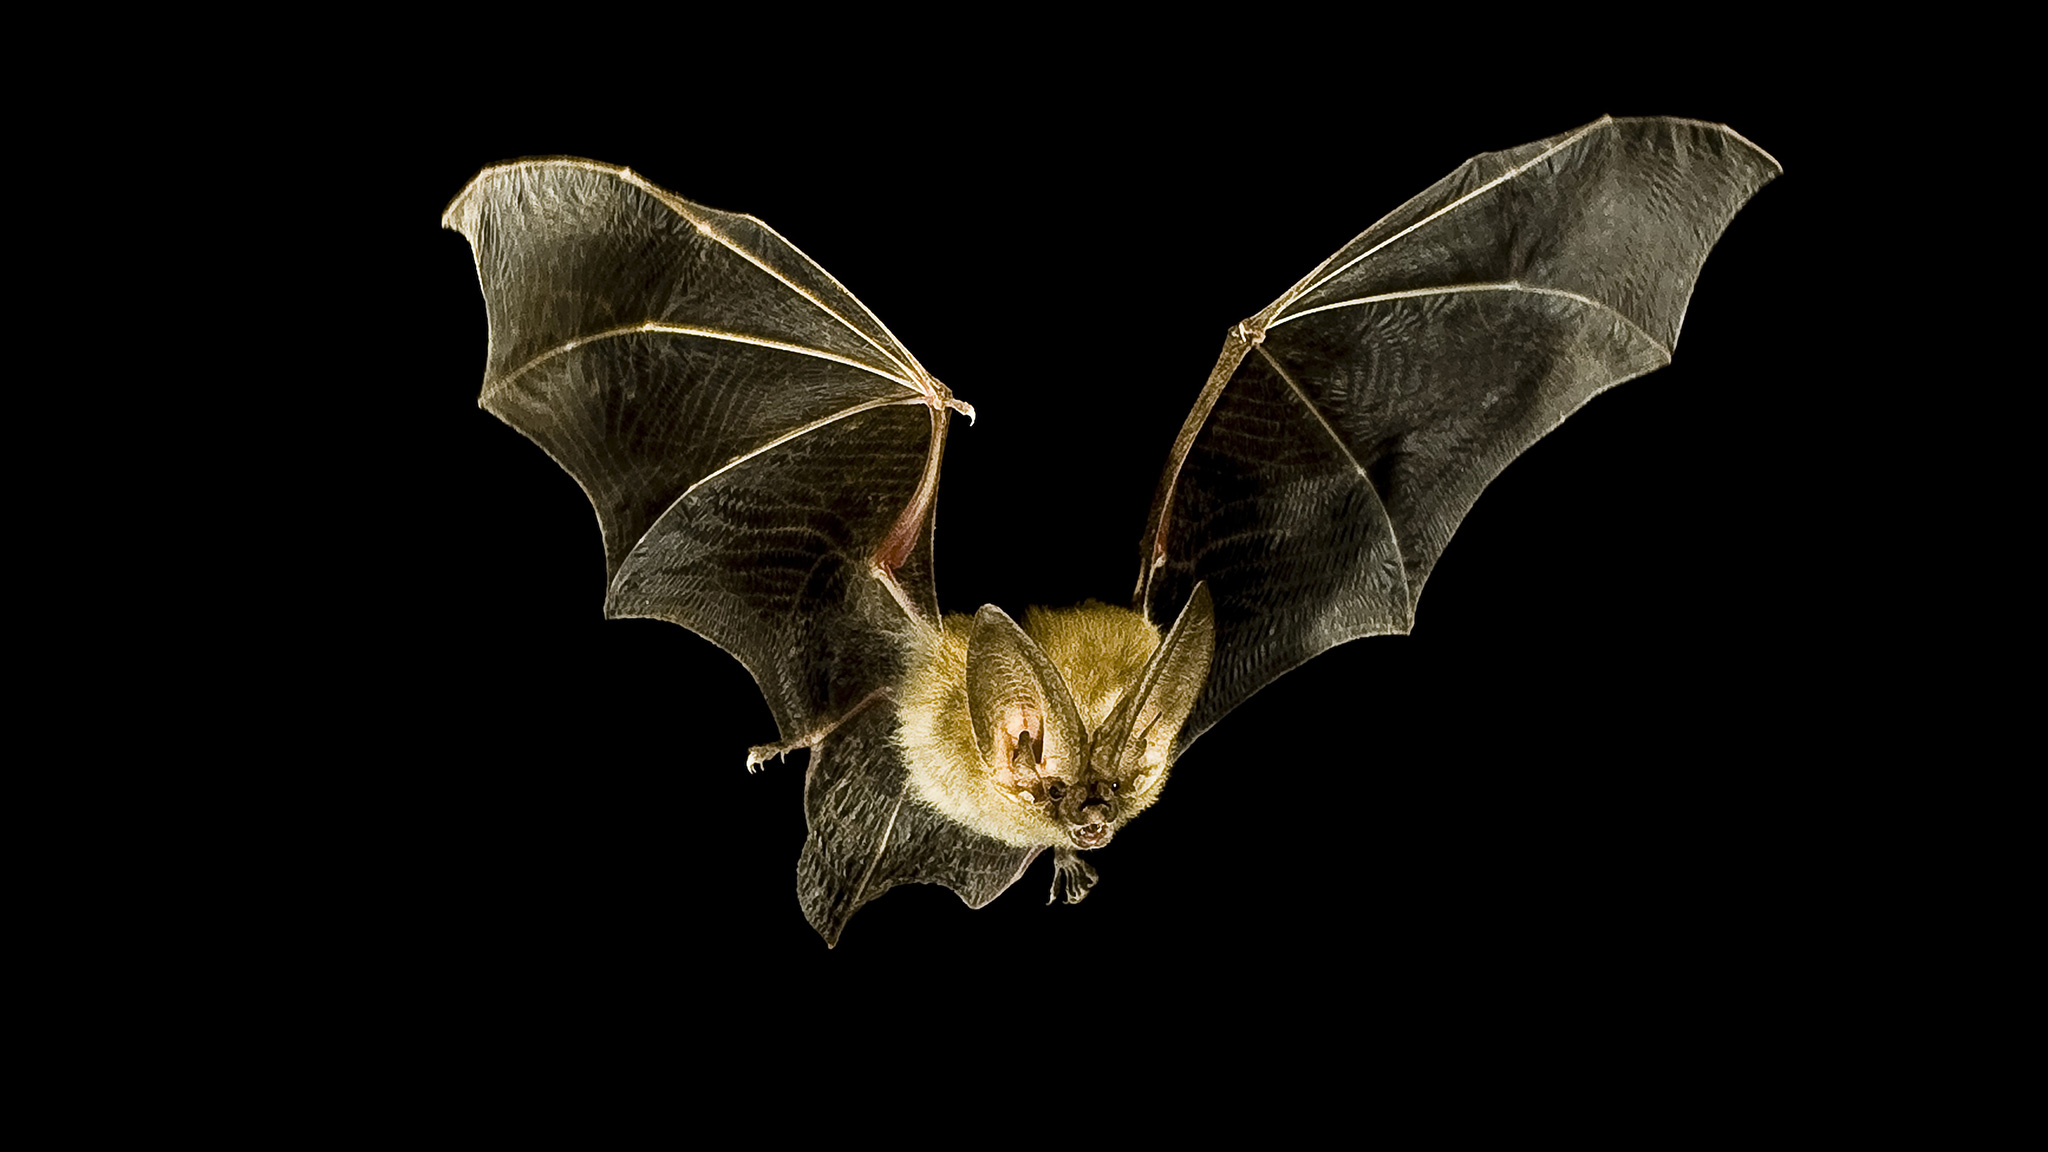 bat-inline.jpg